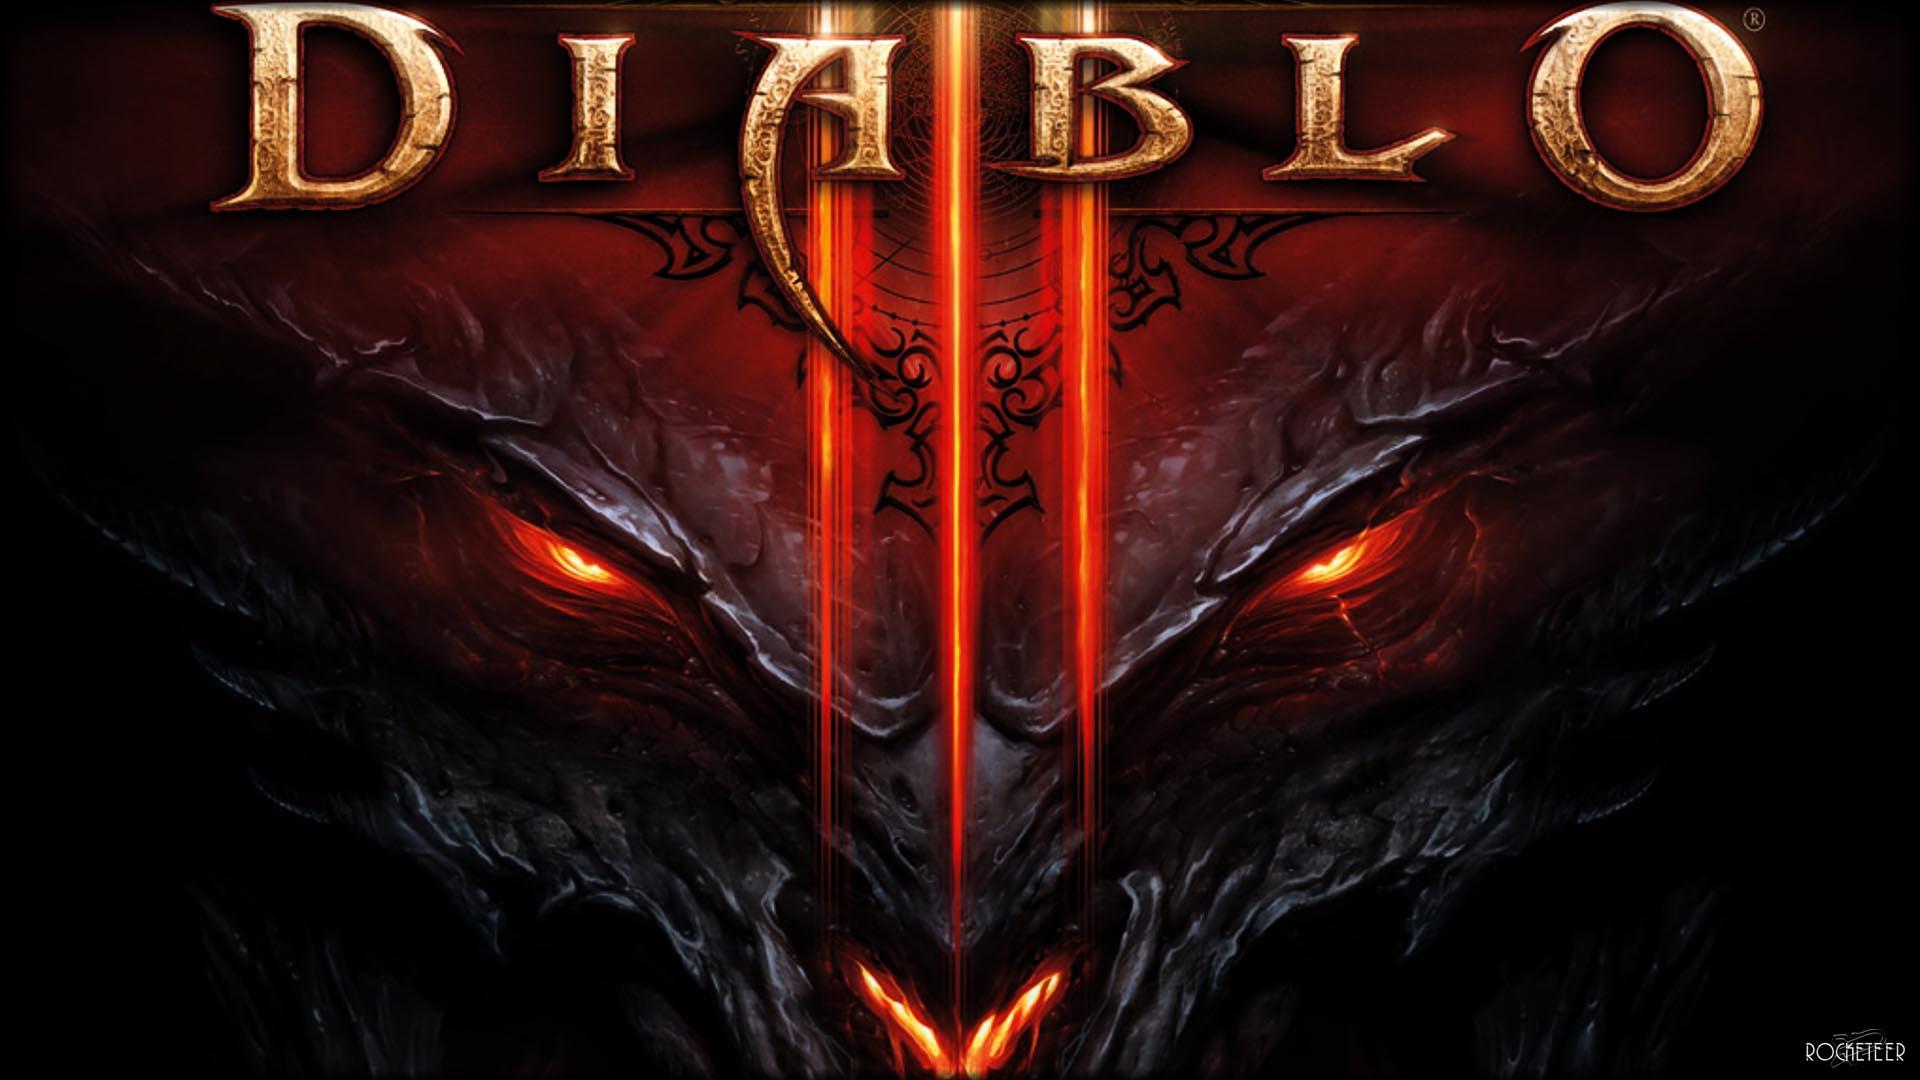 Diablo 3 Wallpapers 1920x1080 Wallpaper Cave